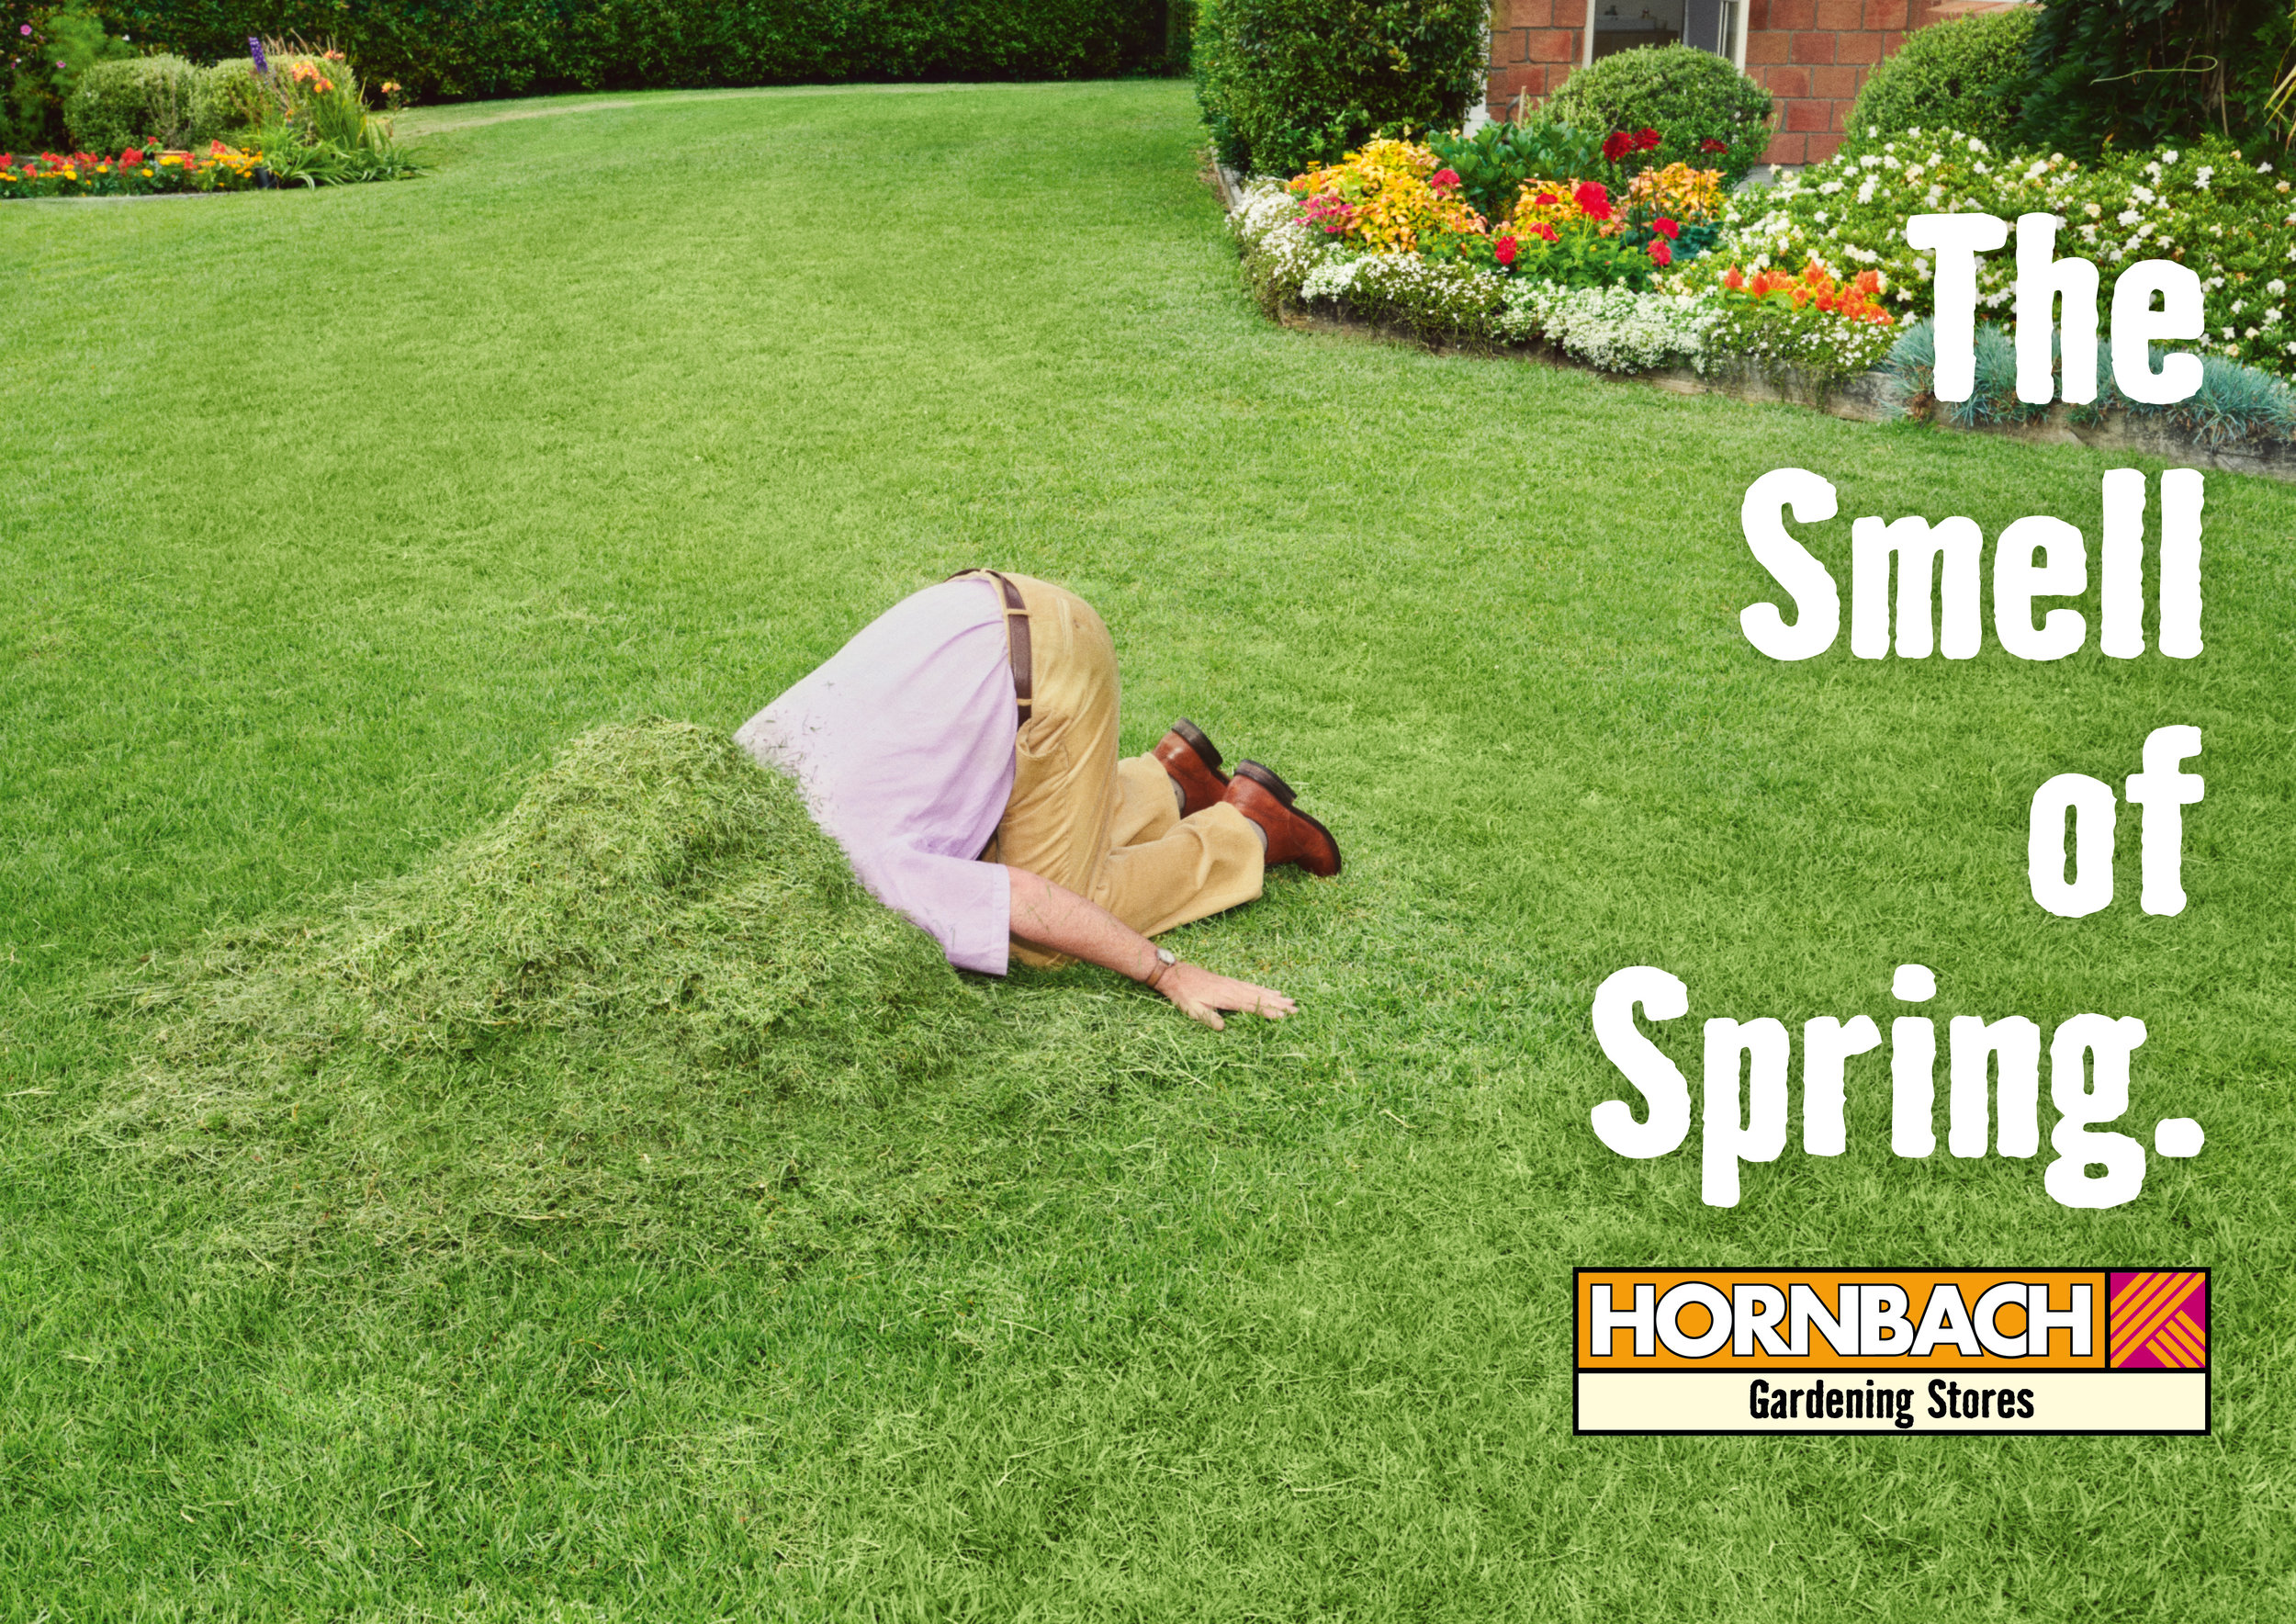 HORNBACH_Smell_of_Spring_Grass_RGB.jpg